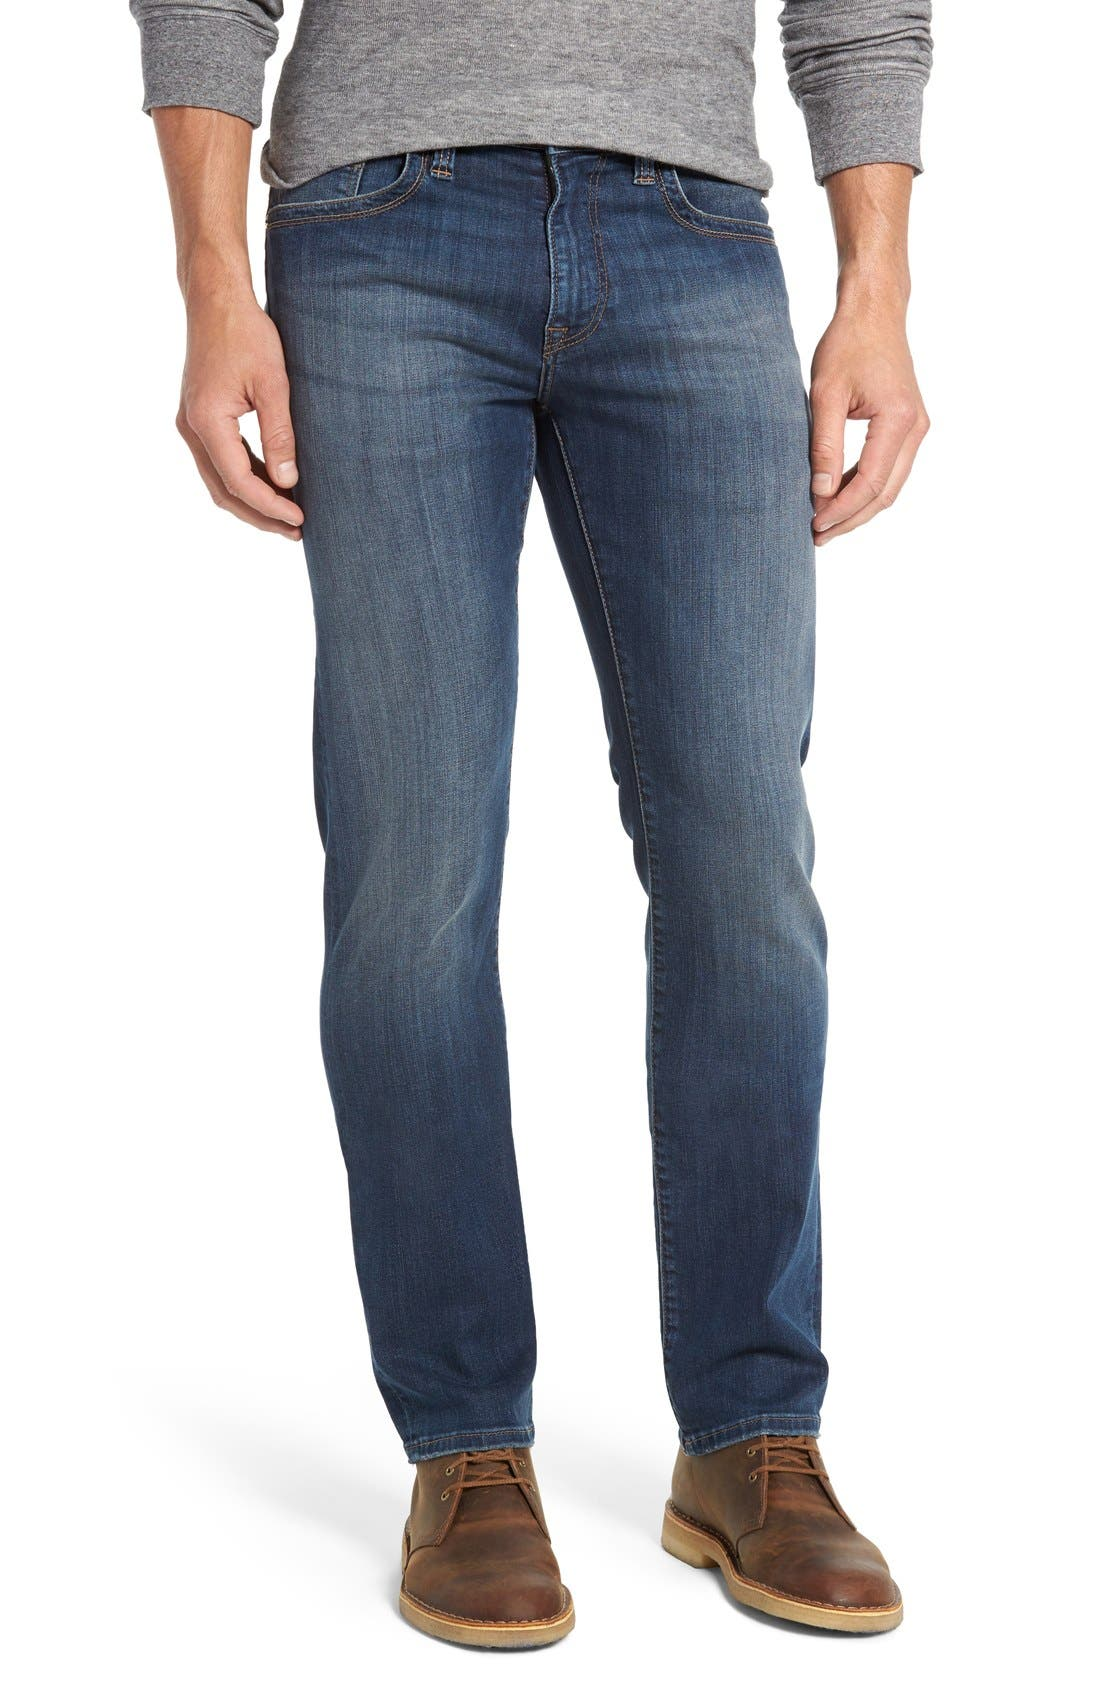 Men's 34 Heritage Courage Straight Leg Jeans,  35 x 32 - Blue